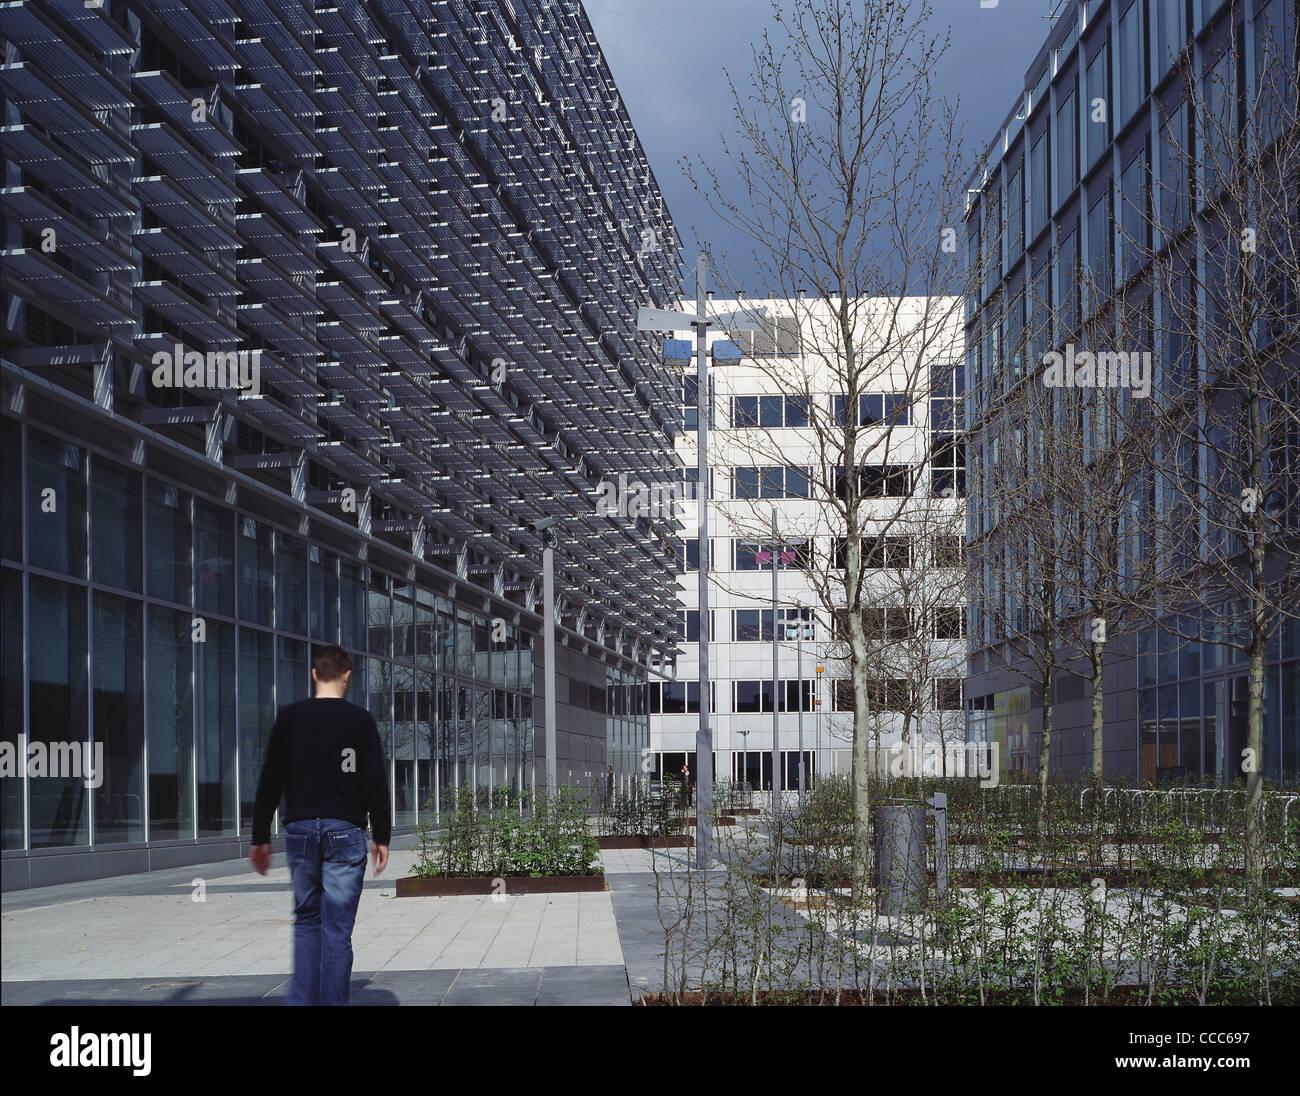 BBC MEDIA VILLAGE VIVA CITY BROADCASTING BUILDING STREET VIEW B